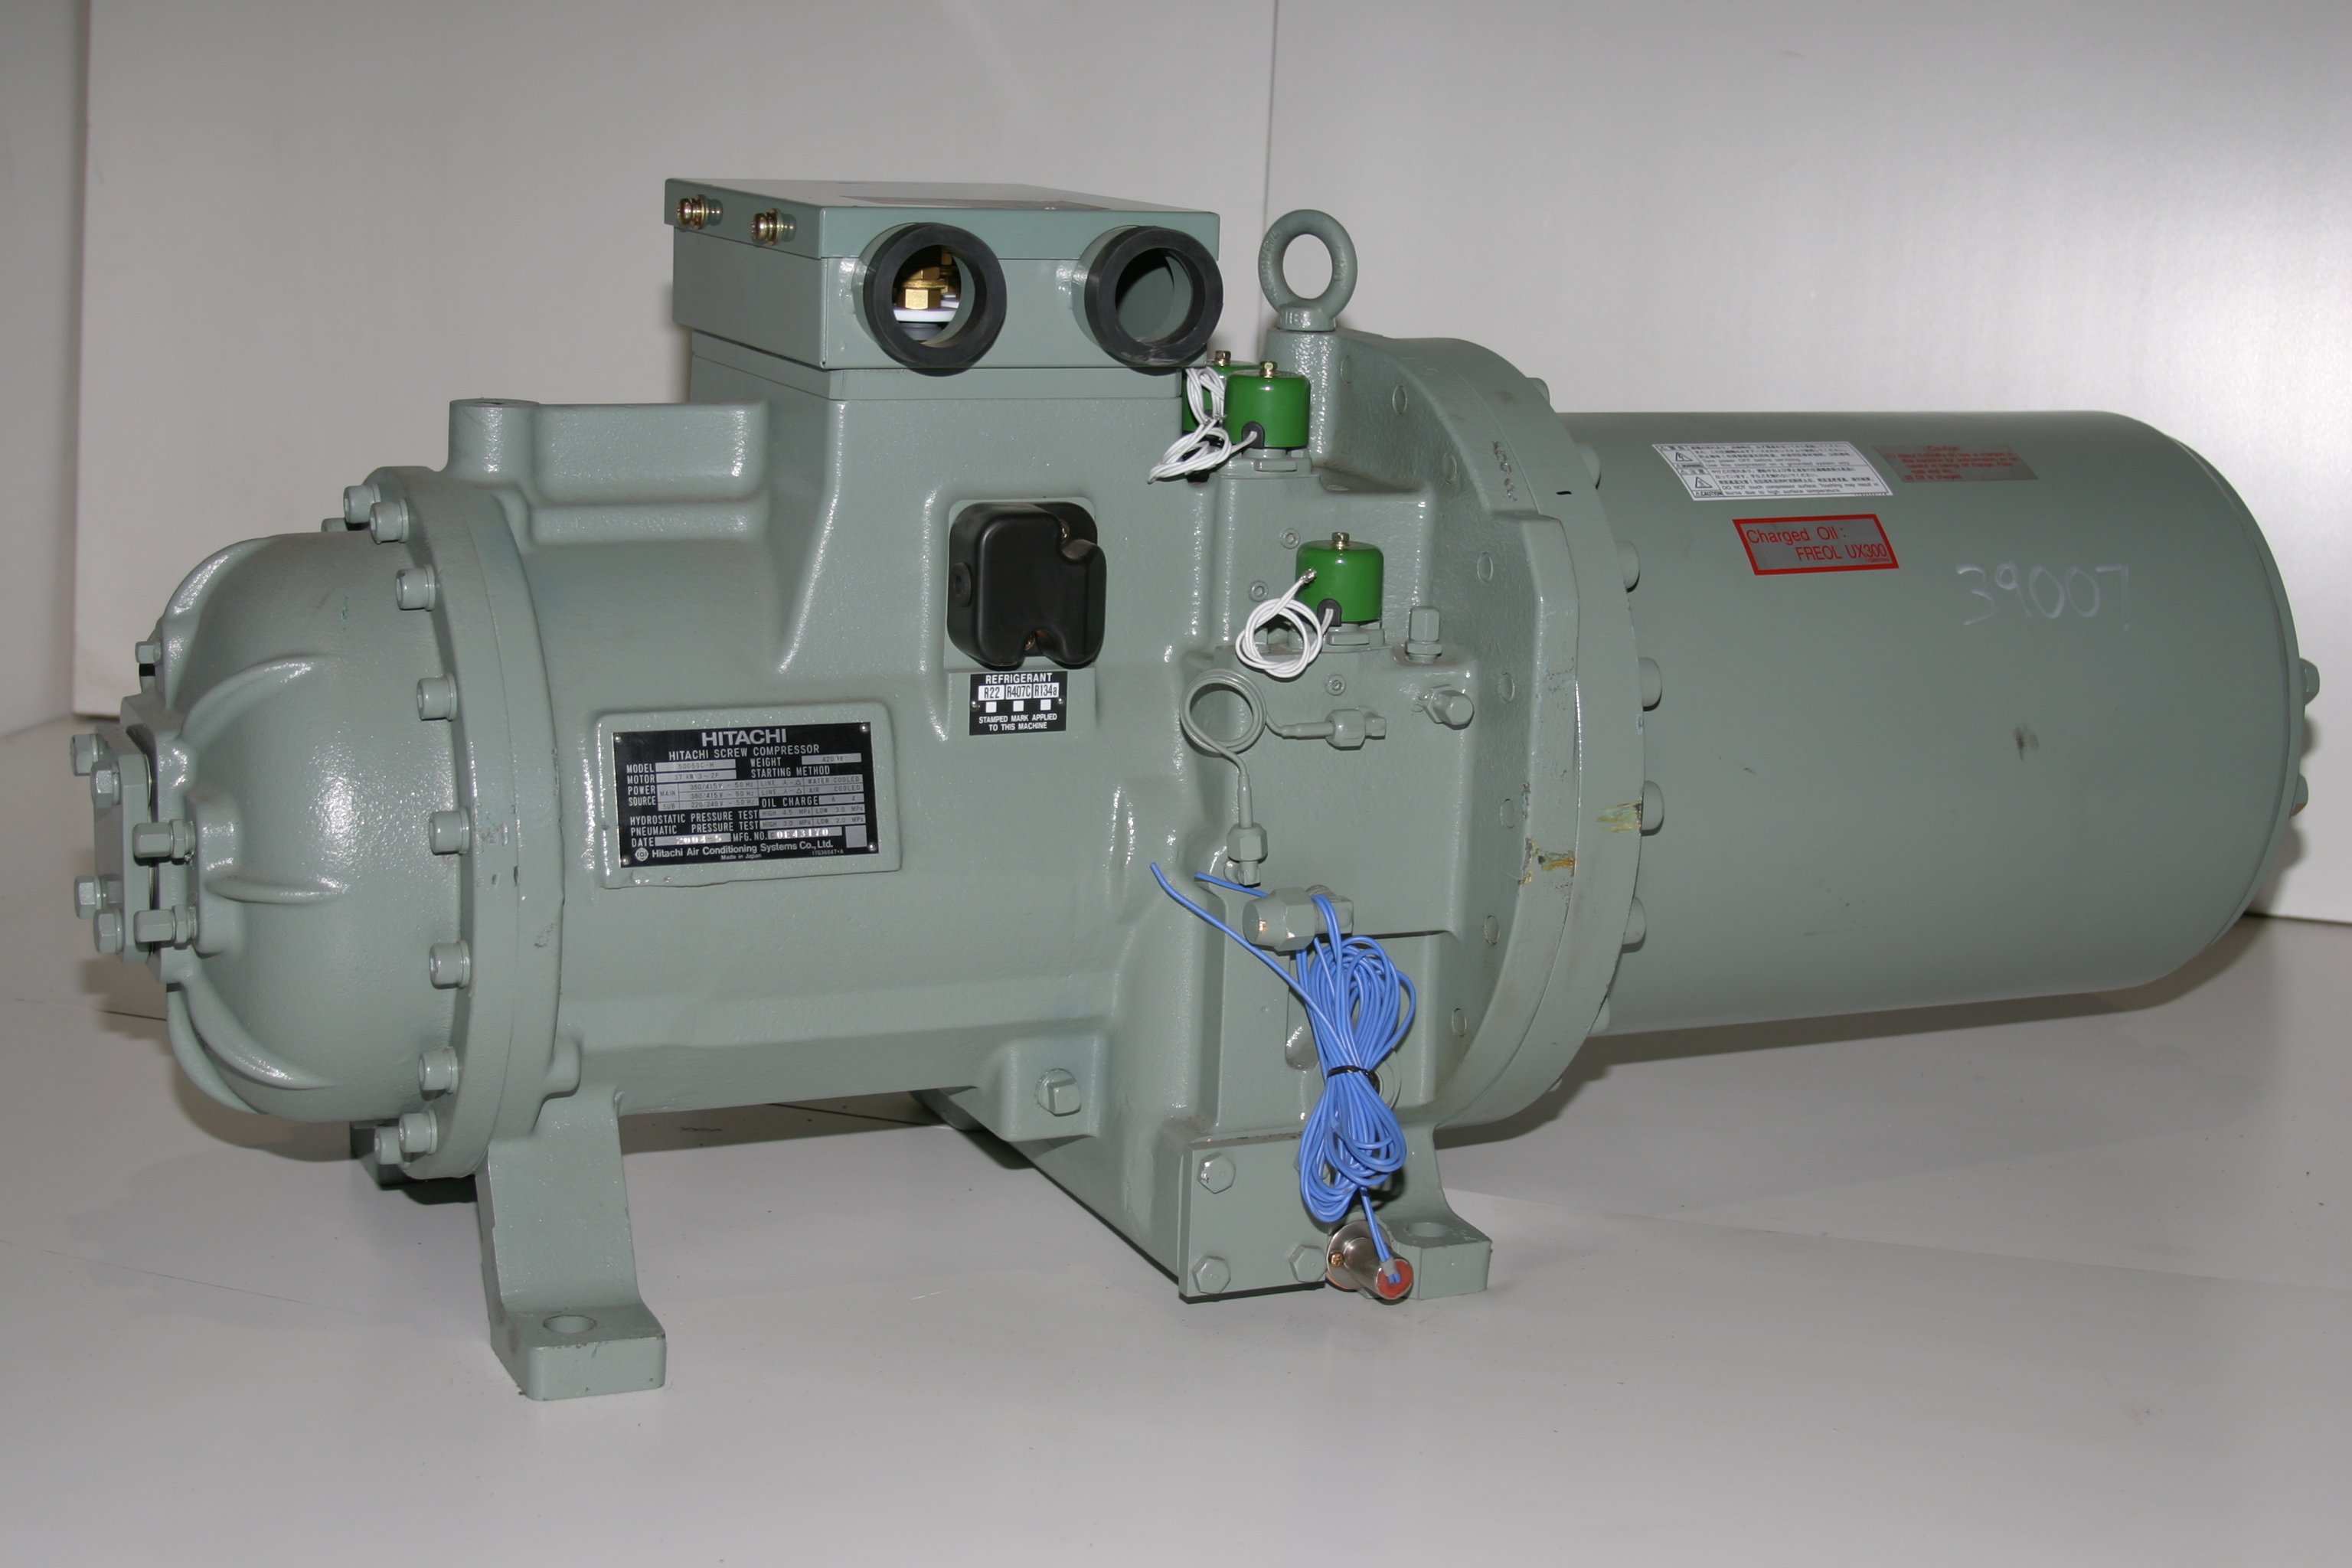 rh sre aircon com hk Hitachi Cooling System Hitachi Air Conditioner